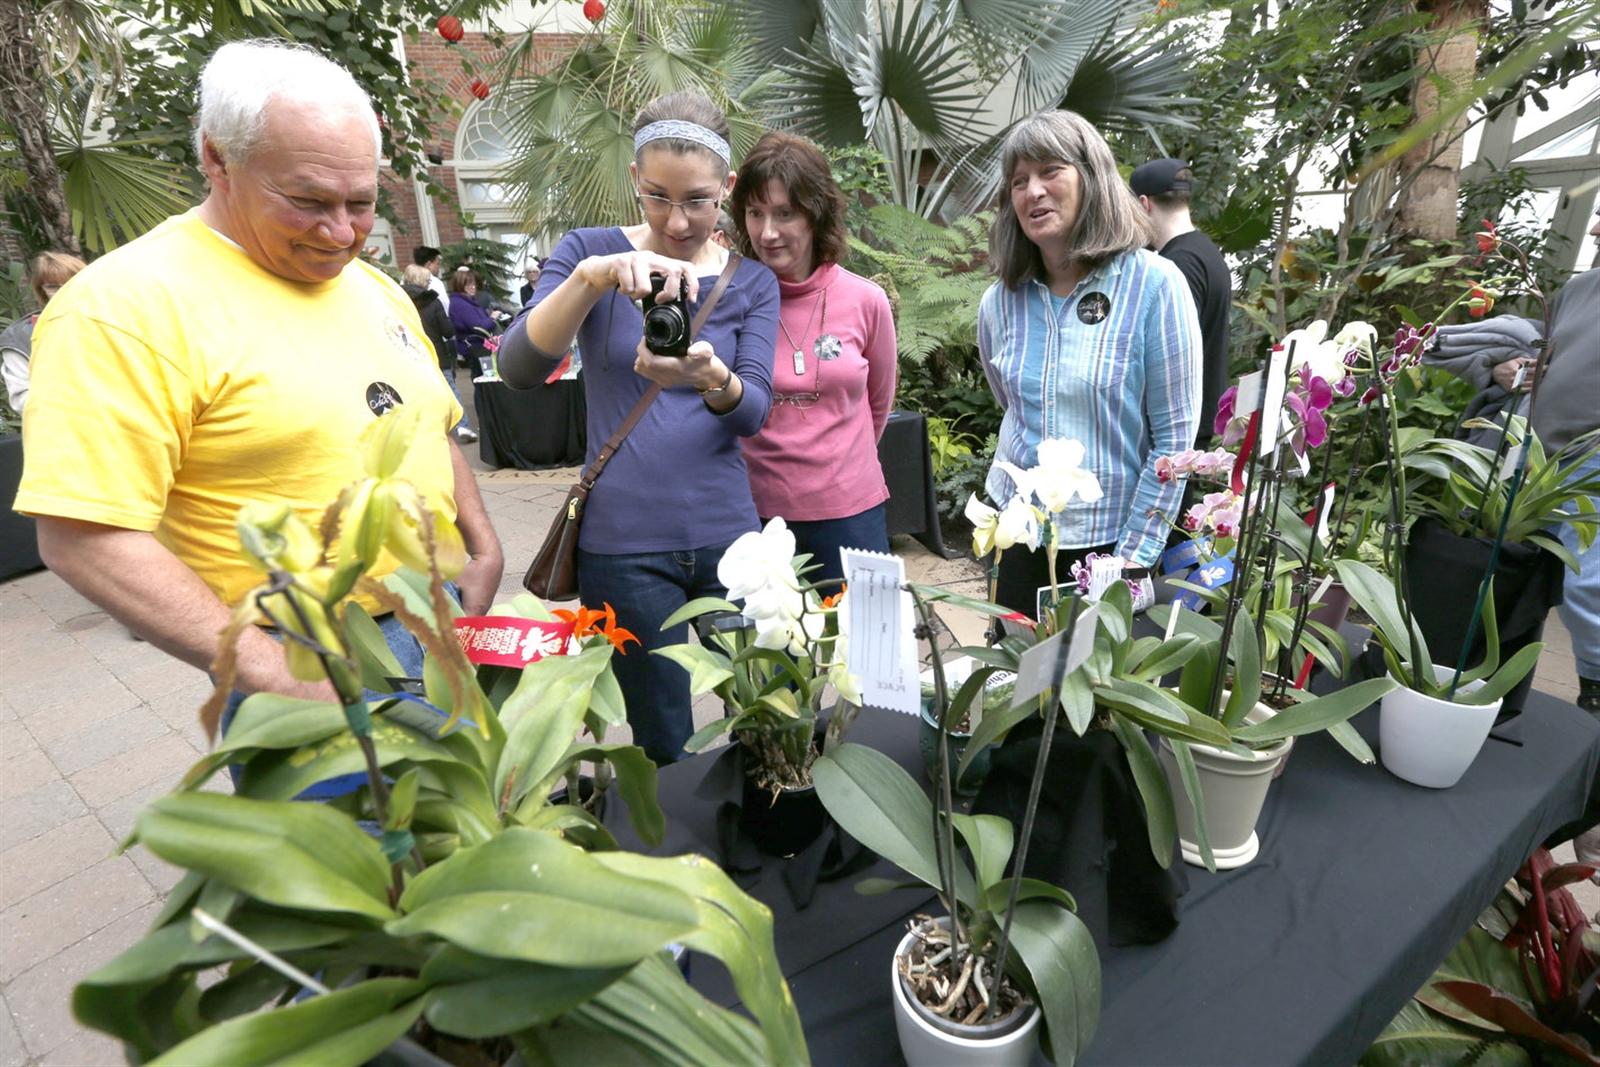 From left, Ray Wiser, of South Wales, Laurel Hendershott of Warsaw, Kathy Hendershott and Carrie Wiser stop to admire the orchids. (Robert Kirkham/Buffalo News)